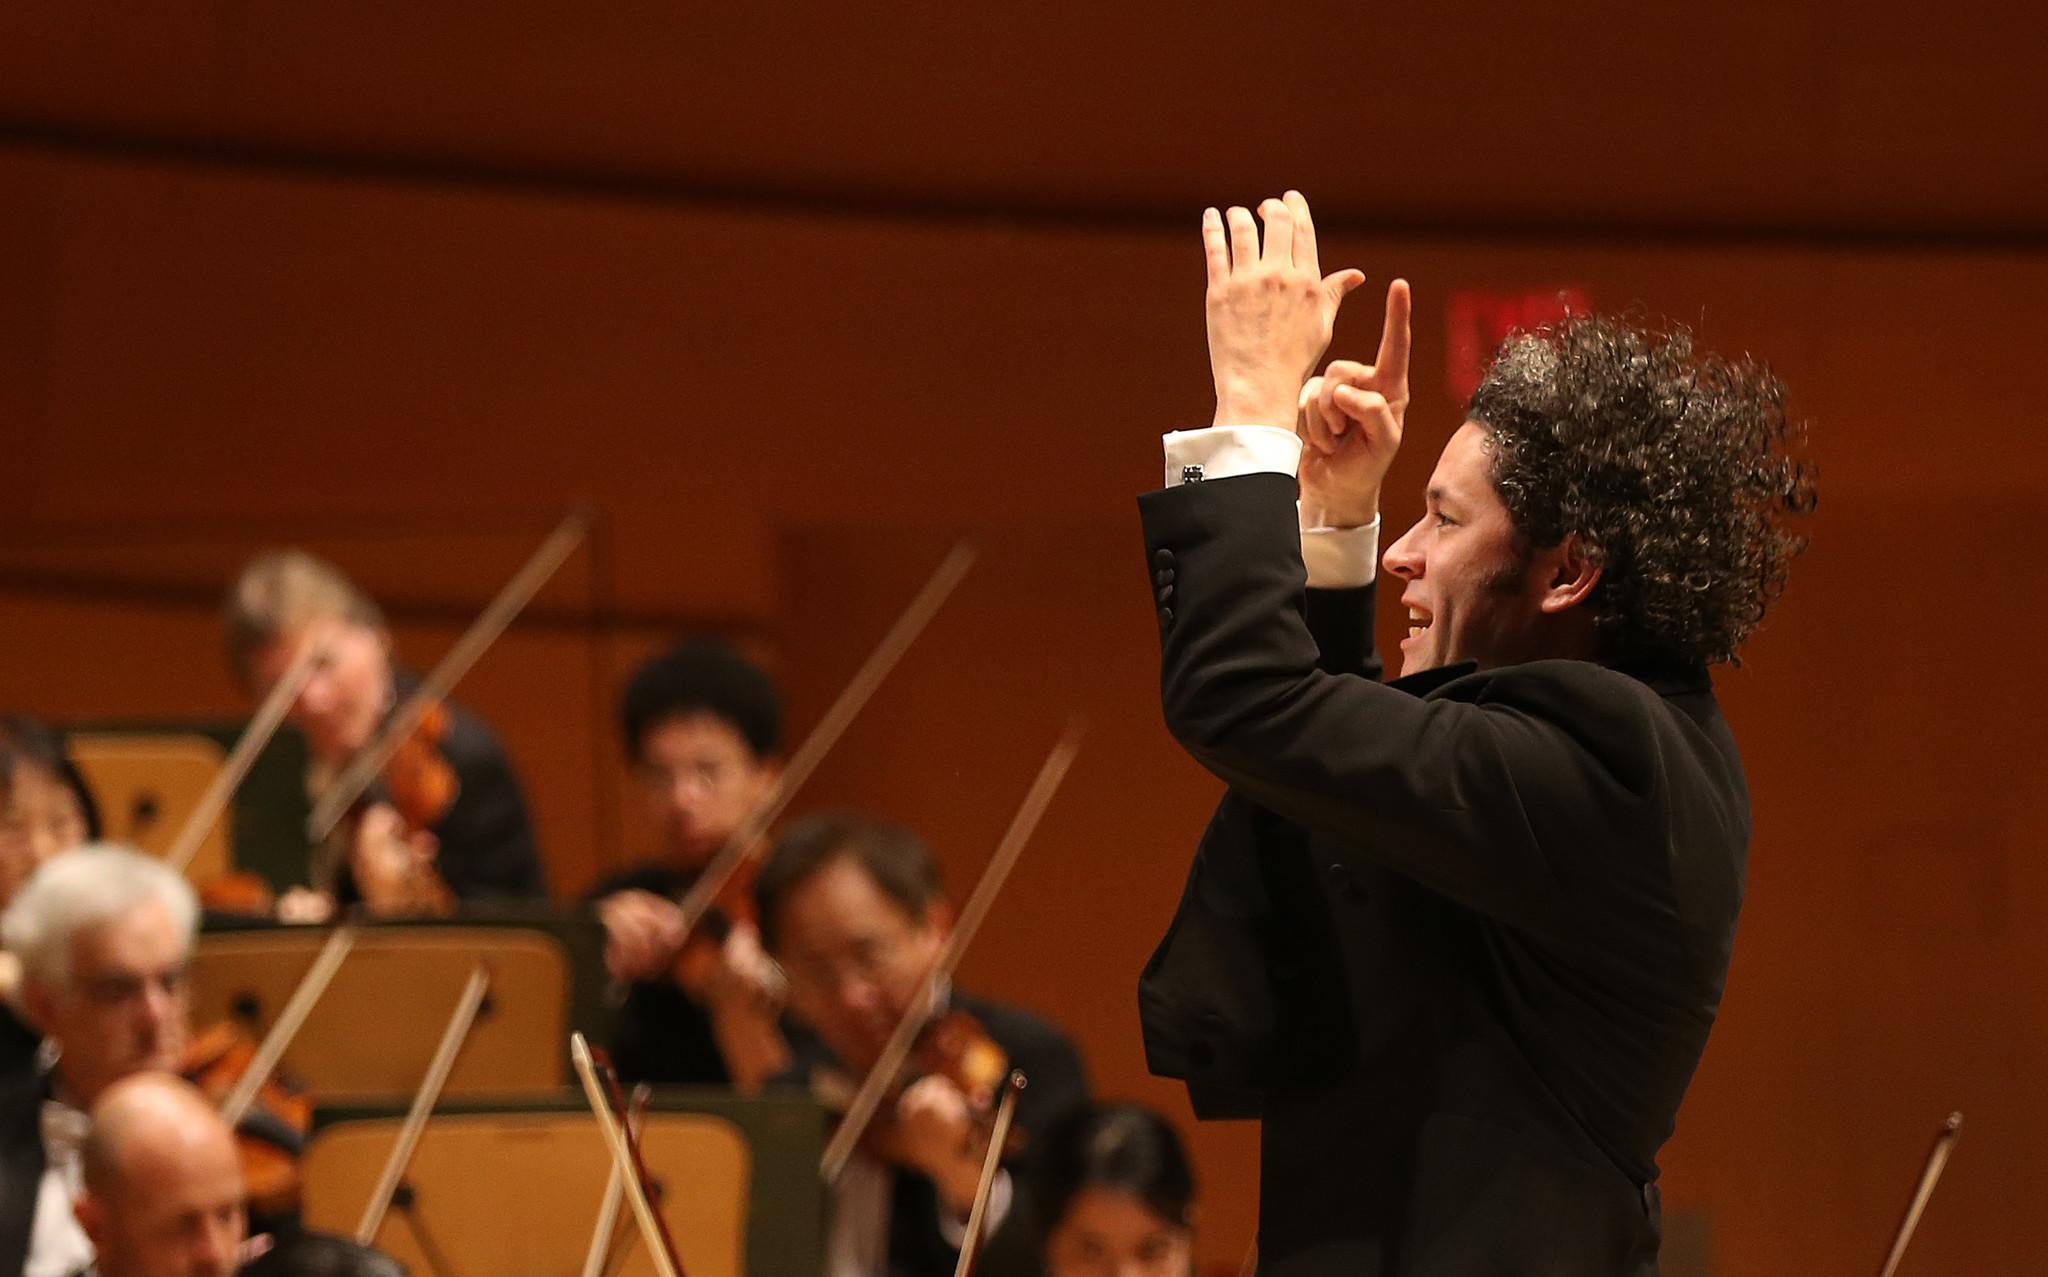 Los Angeles Philharmonic Music Director Gustavo Dudamel, conducting Friday night.